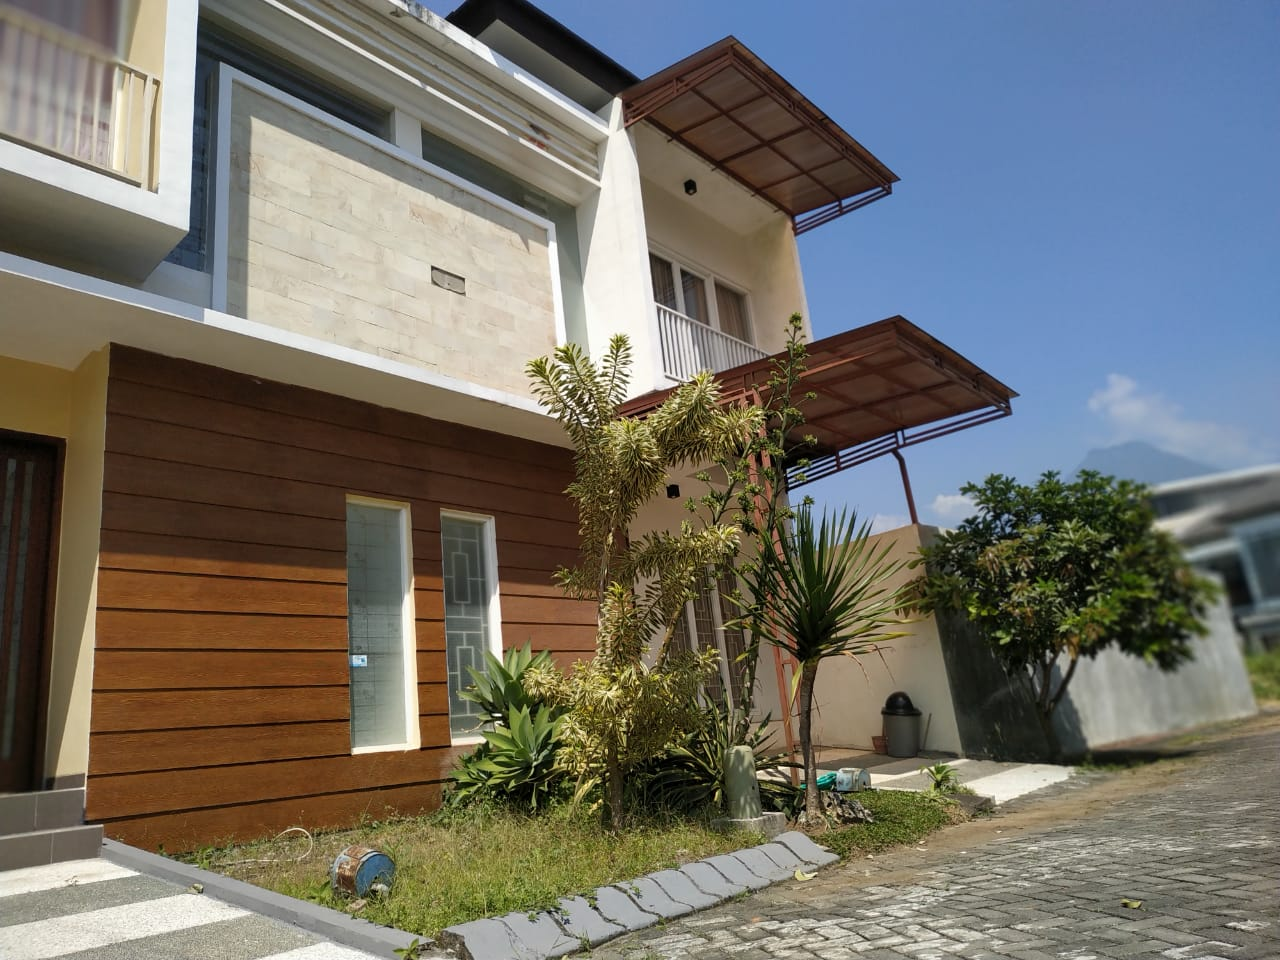 listing - Jual villa 3 lantai batu